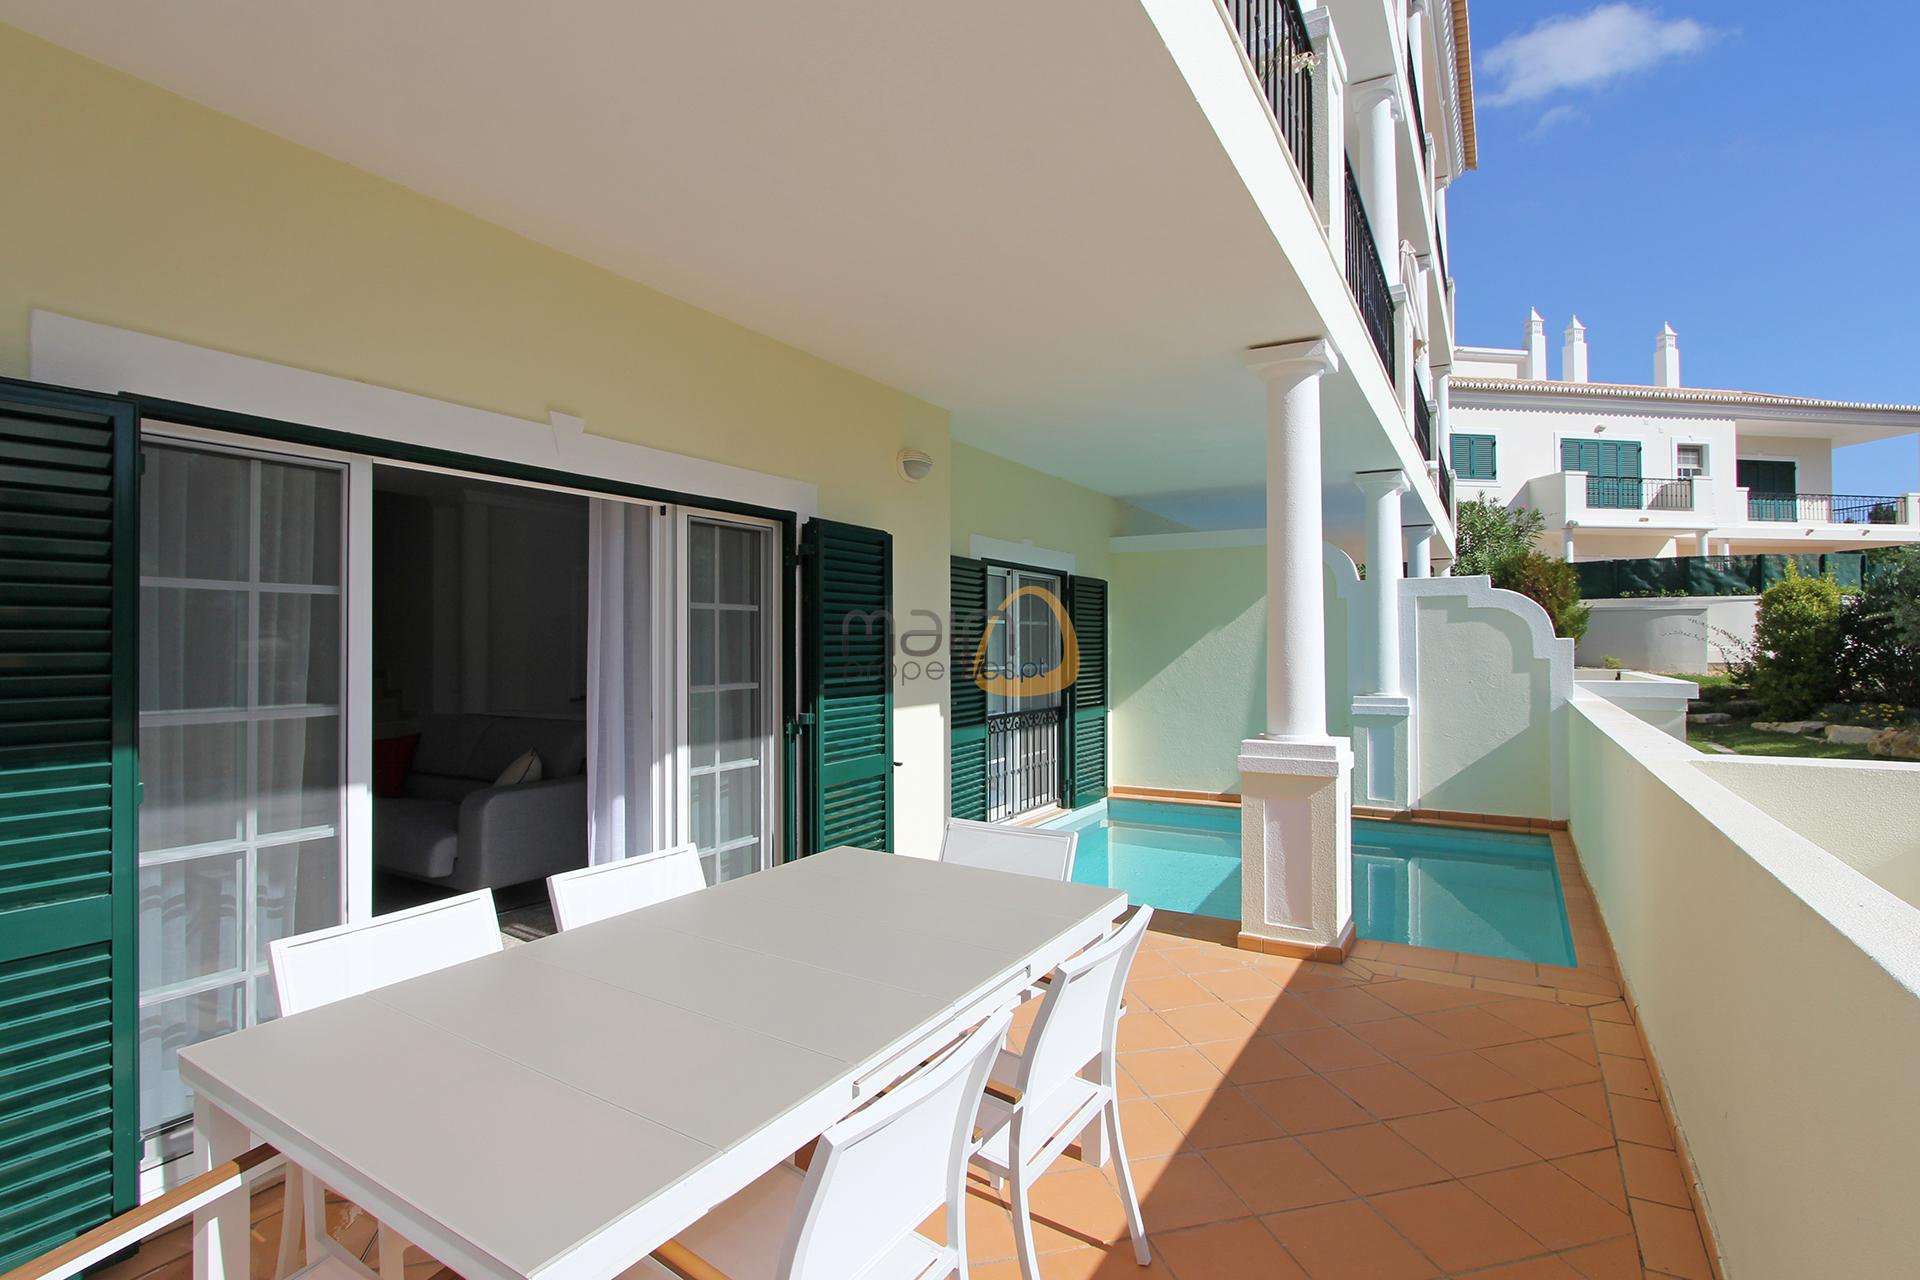 apartment-in-vale-do-lobo-algarve-golden-triangle-portugal-property-real-estate-mainproperties-mp134vdl-1